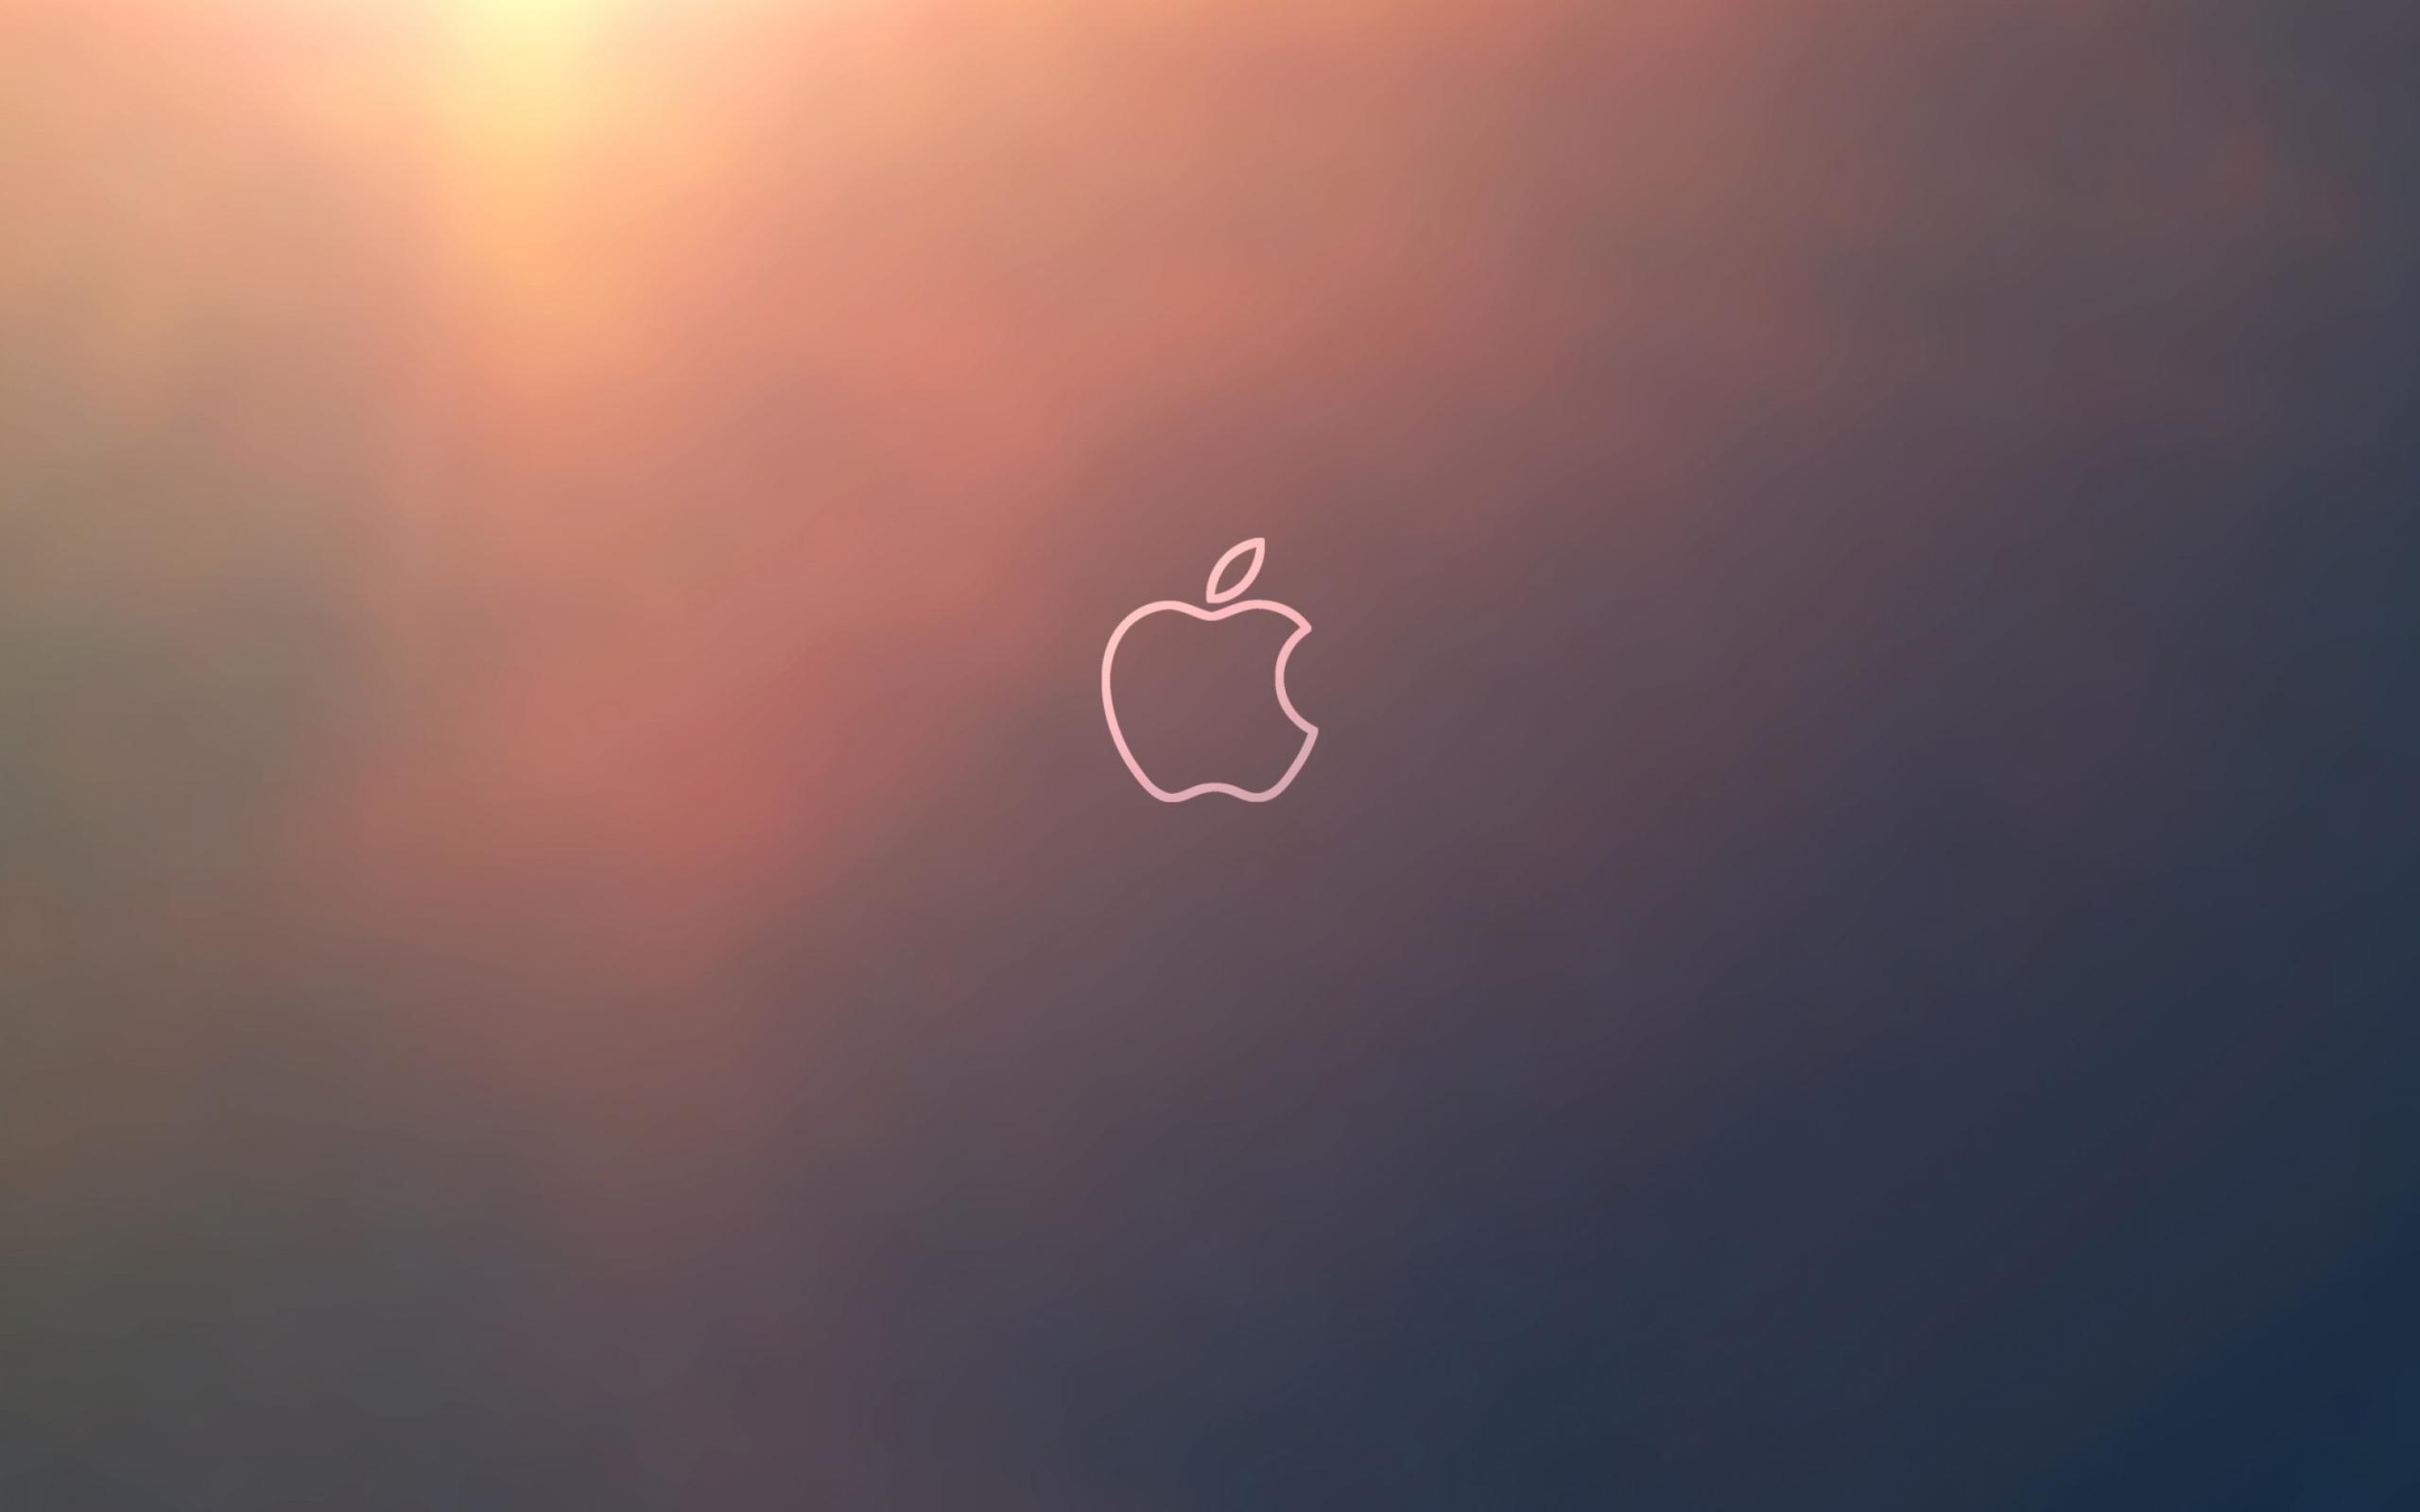 Free Download Macbook Pro Retina Apple Wallpaper Wallpaper